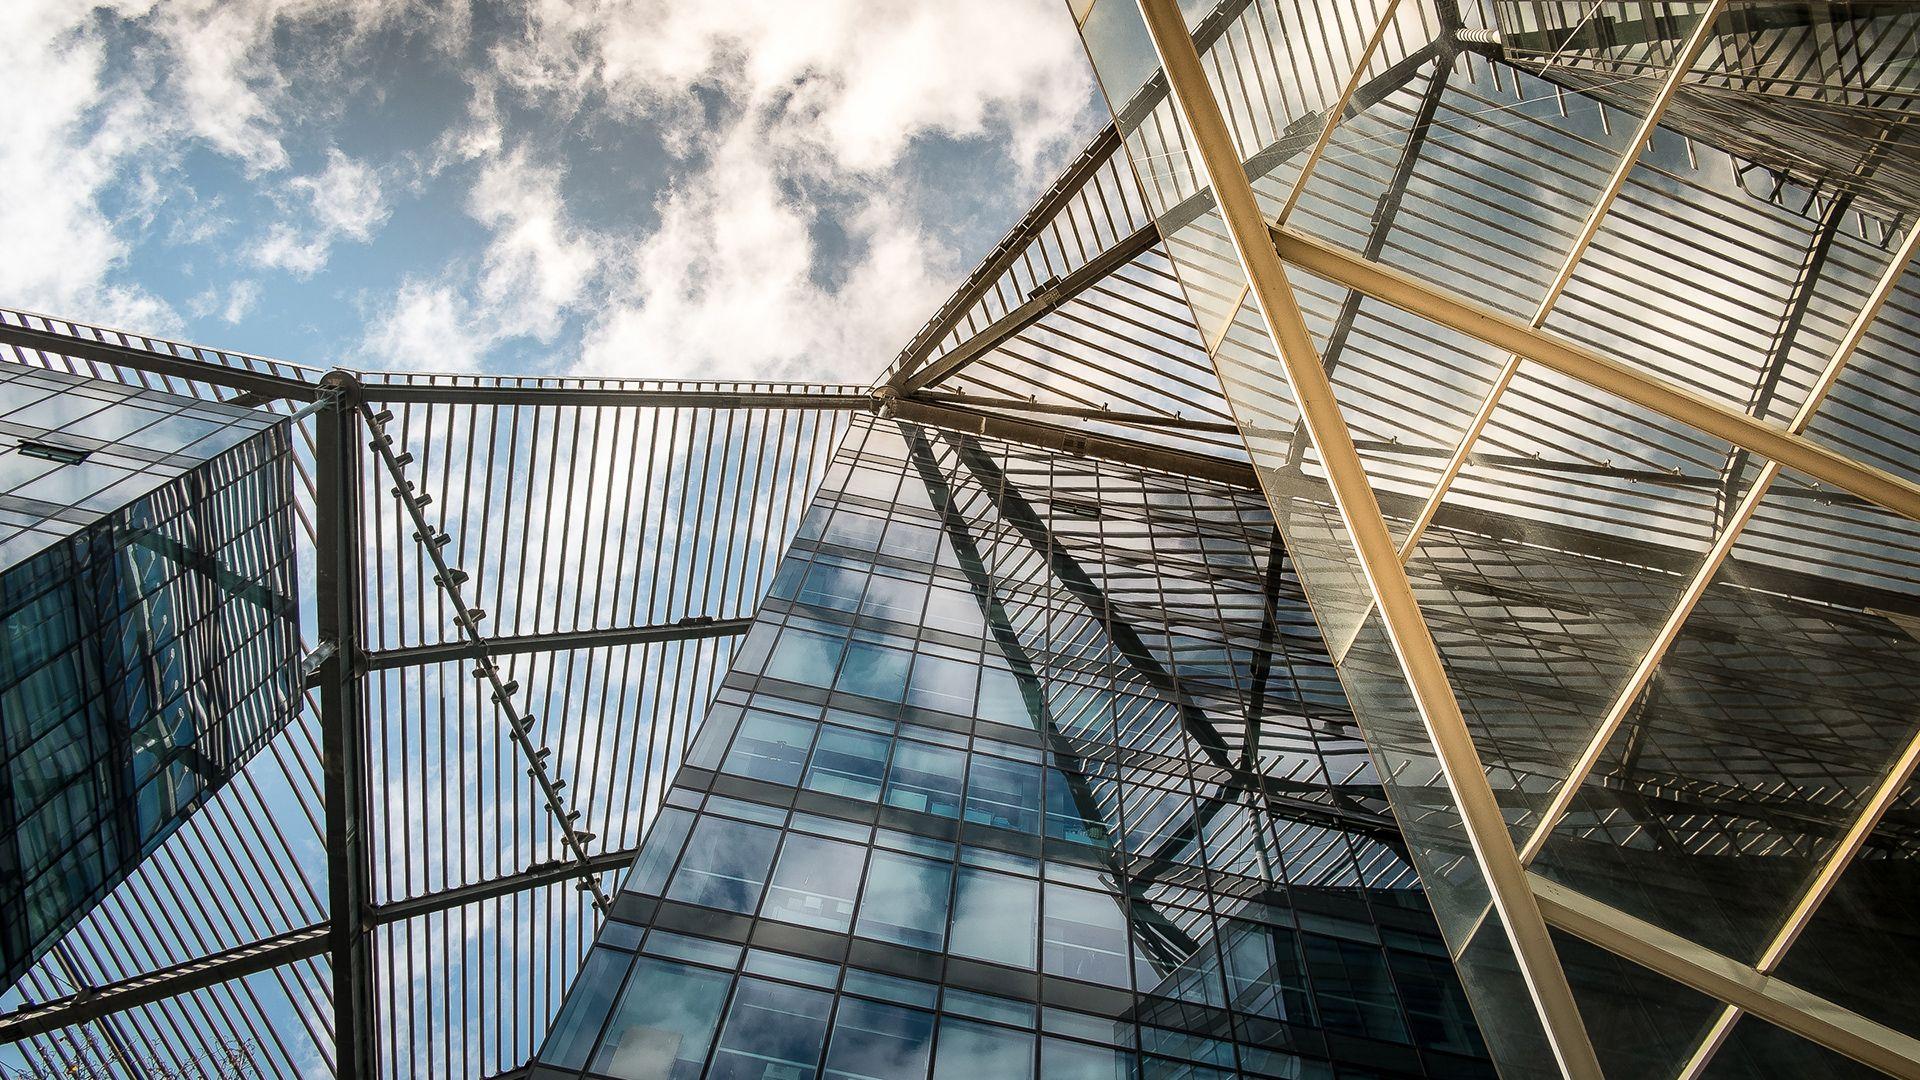 Architecture picture free download